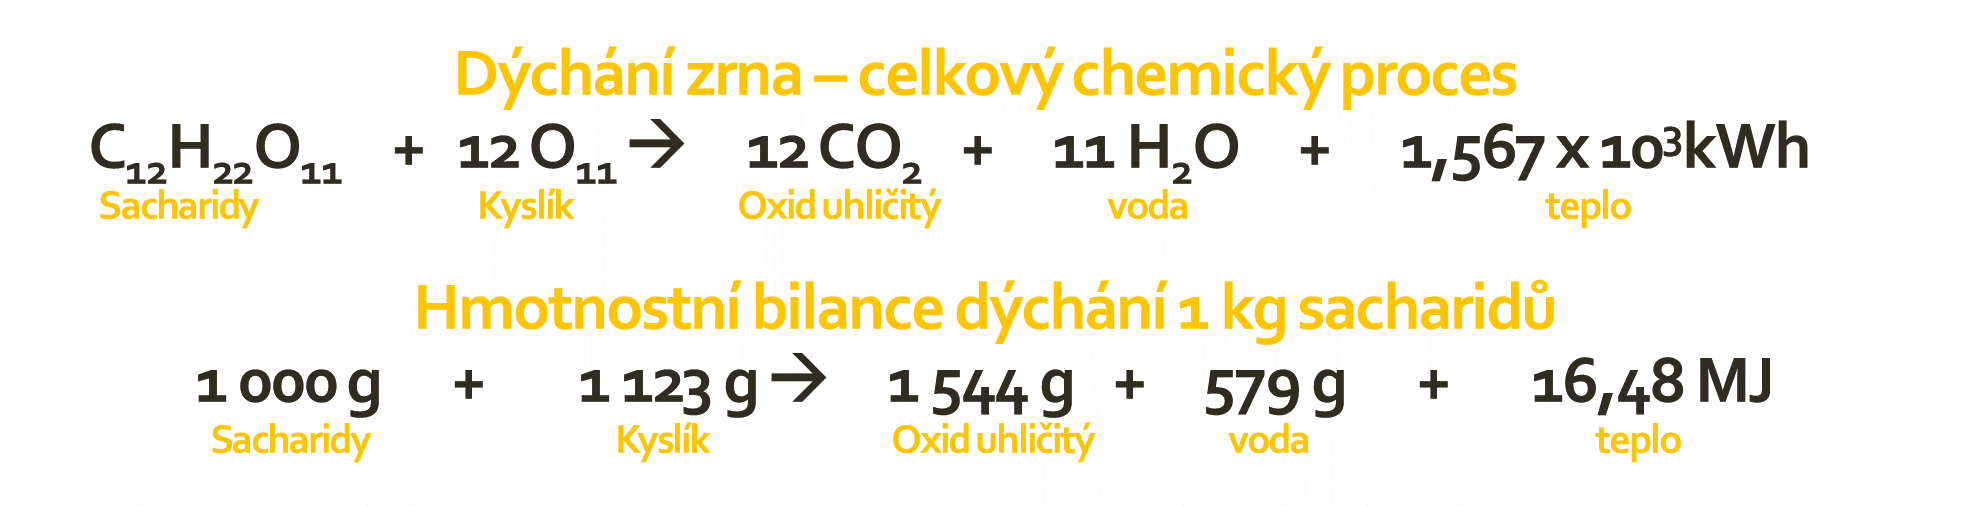 BEDNAR Posklizňové linky - Chemický proces